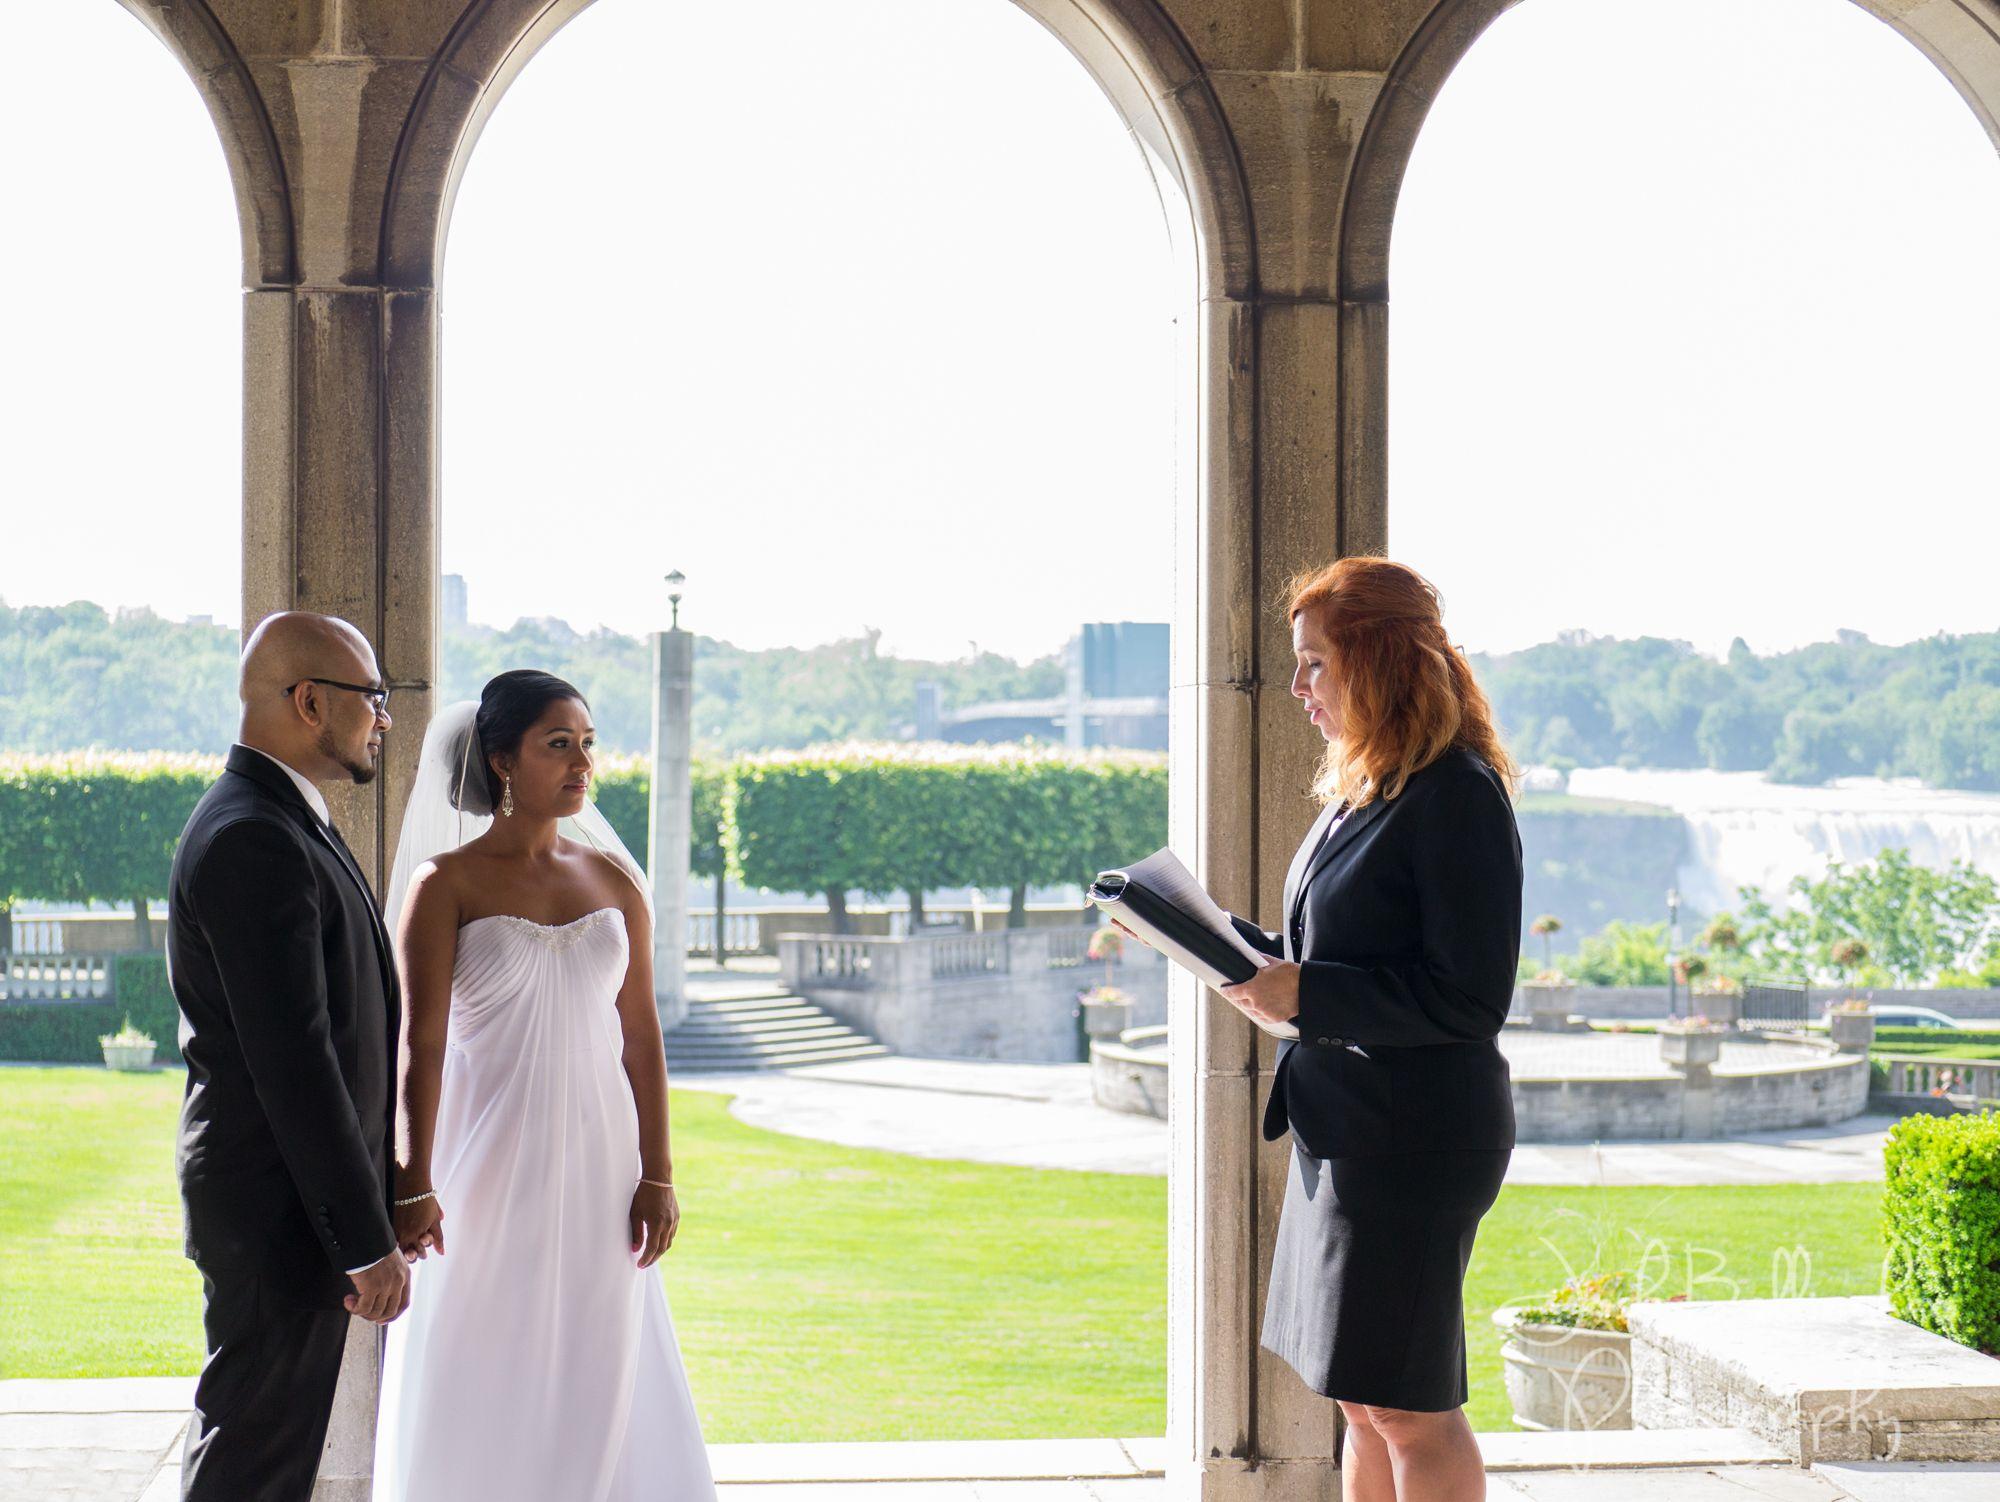 Wedding Ceremony At Niagara Falls Canada In A Pavilion Oakes Garden Theatre Gorgeous